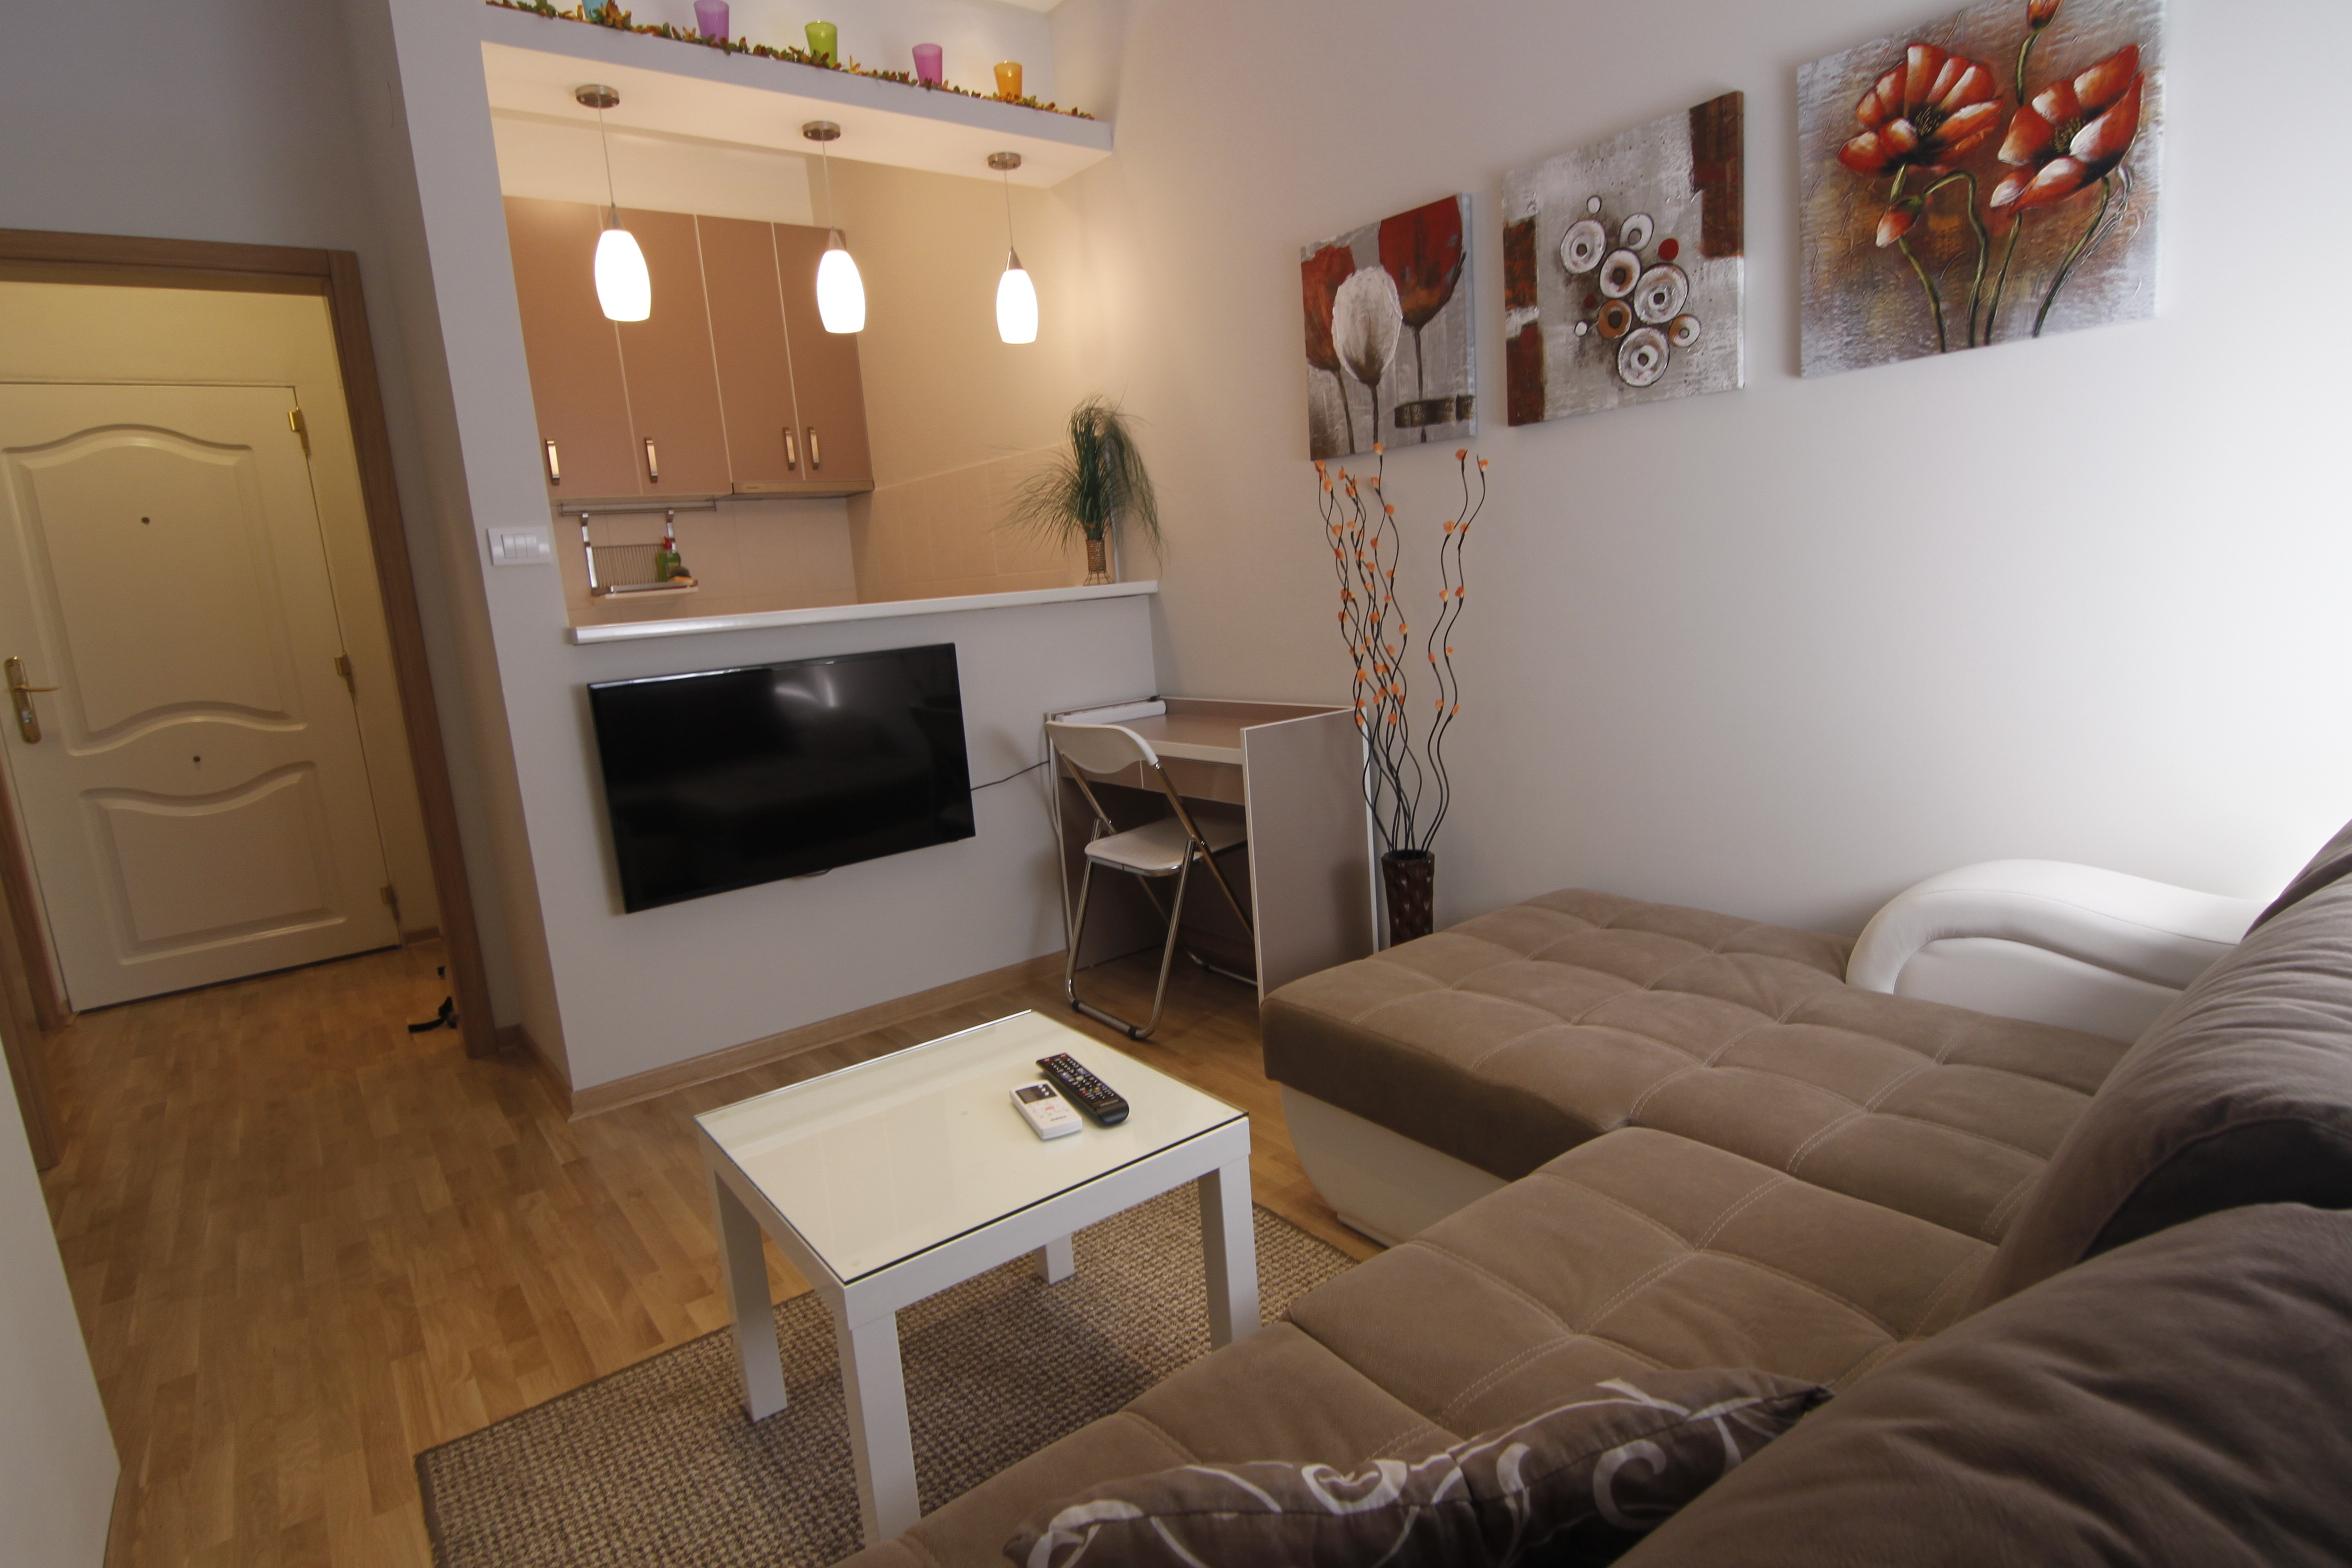 Dnevna i šank ORION Apartman Novi Beograd